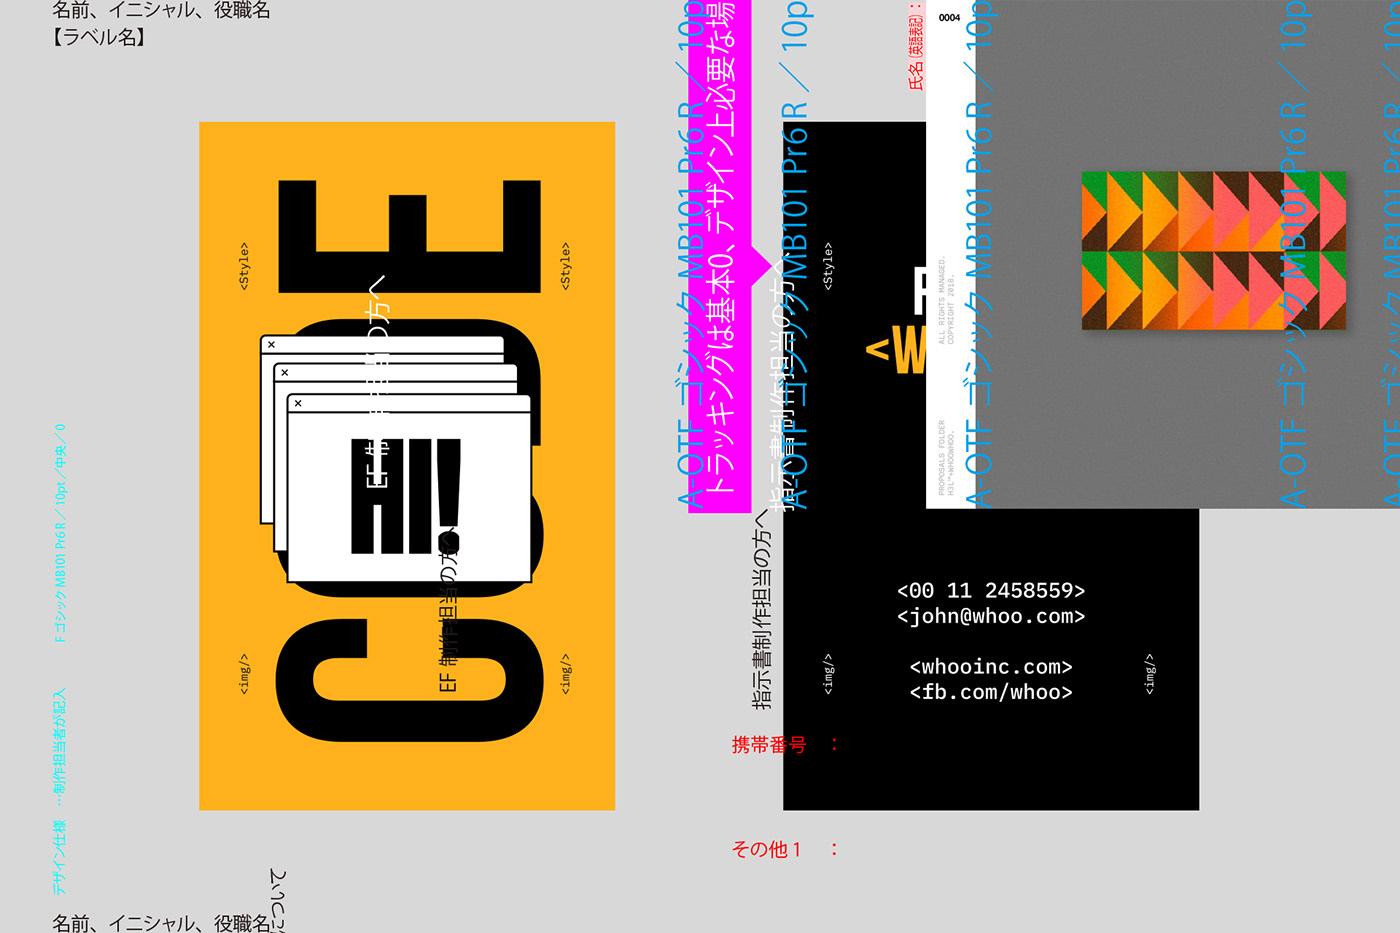 minimal pop japan colors Fun cool fresh grid collages artwork